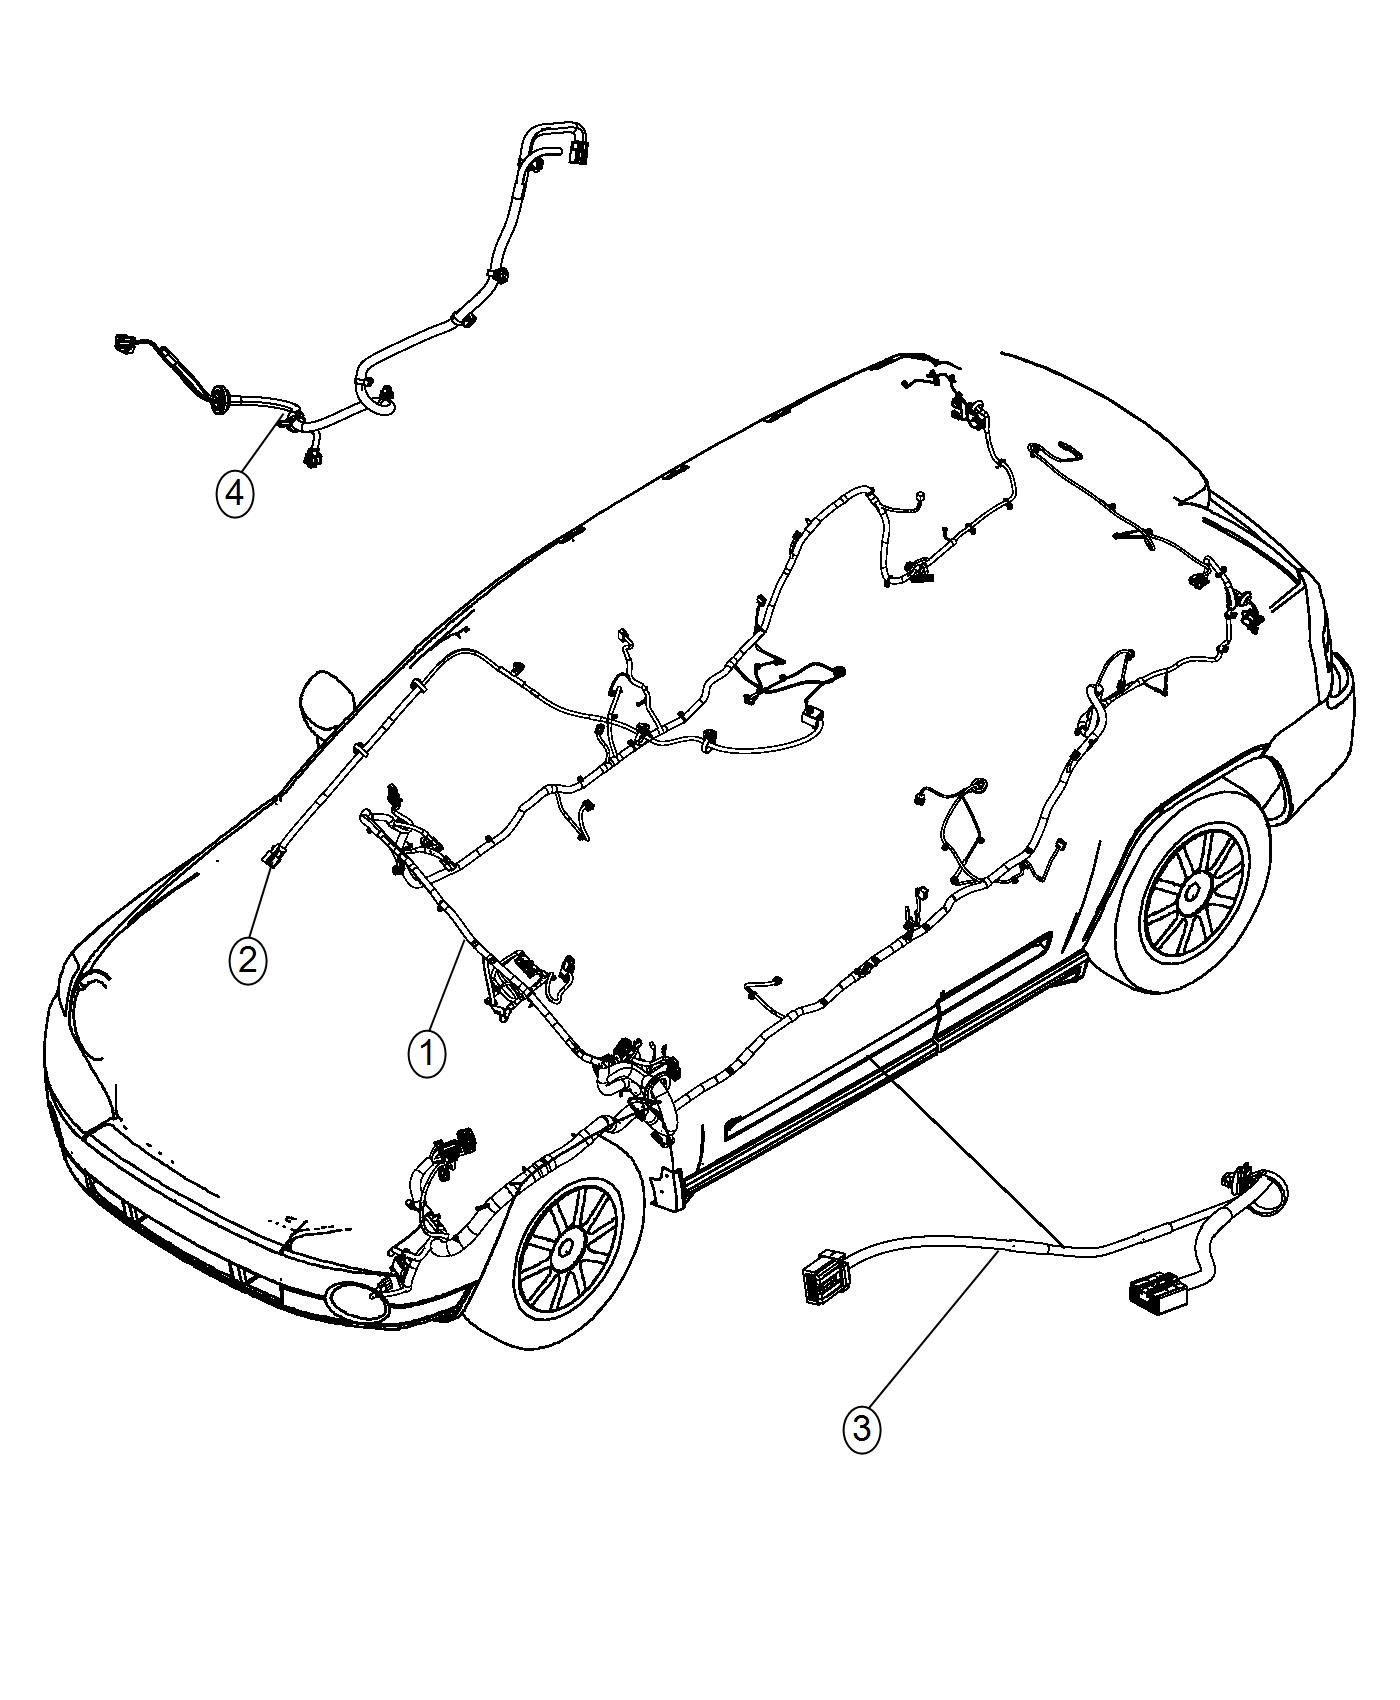 Jeep Compass Wiring Console Export Trim No Description Available